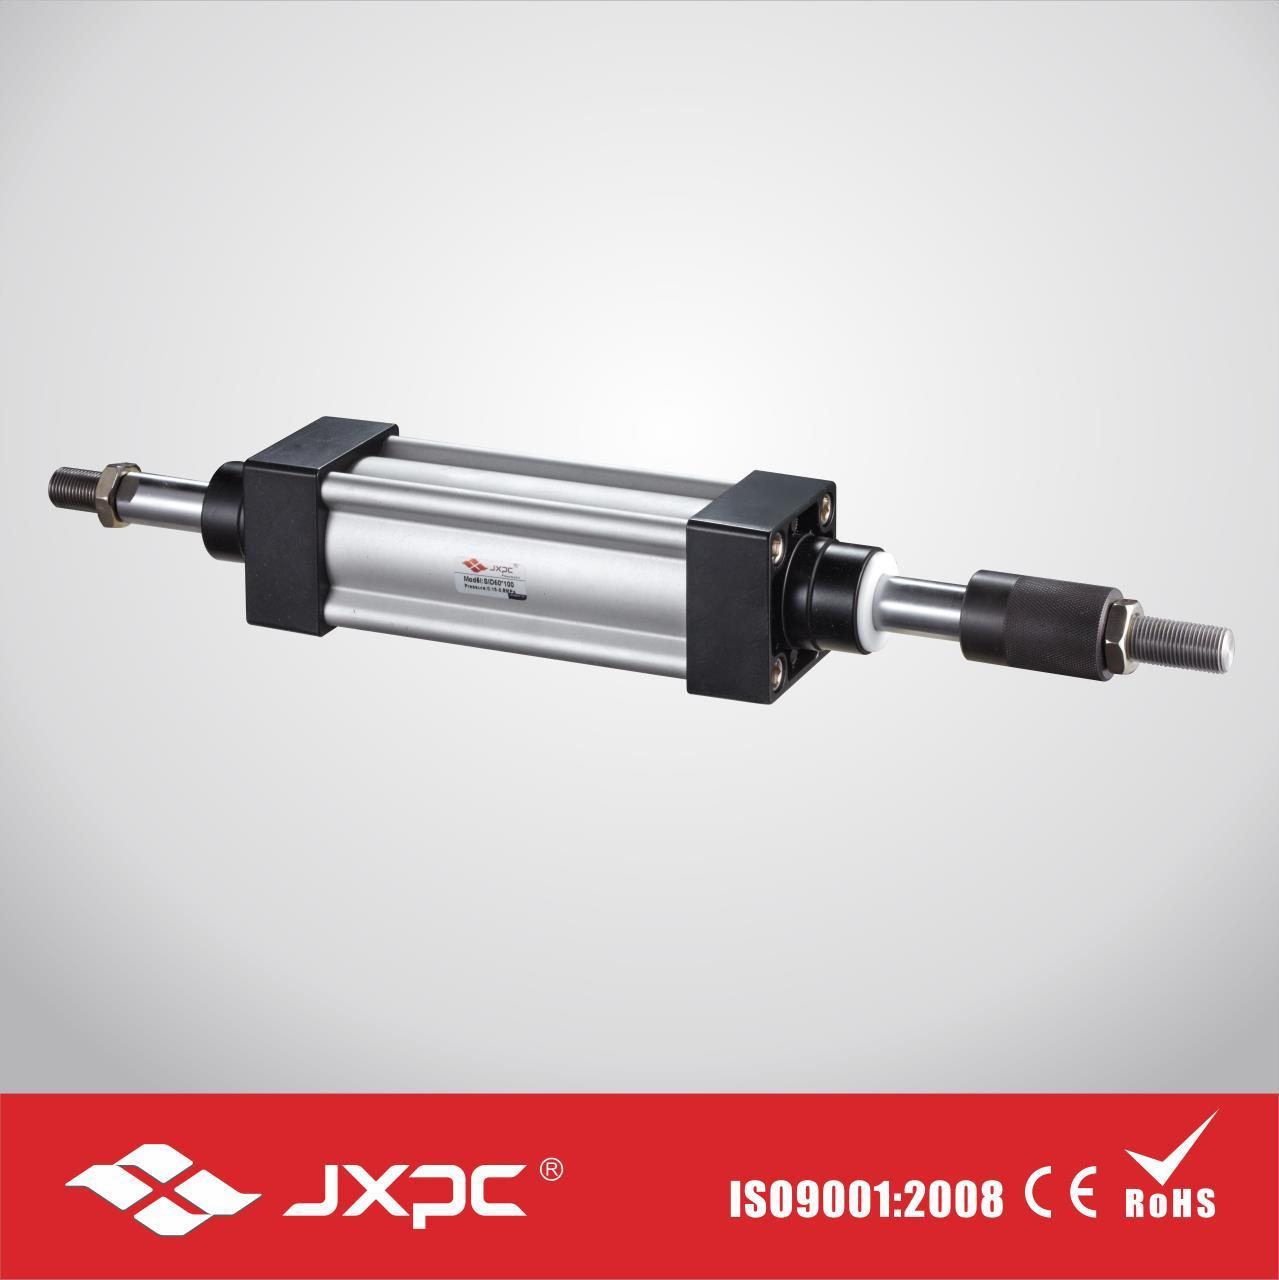 Airtac Type Sda Pneumatic Compact Cylinder